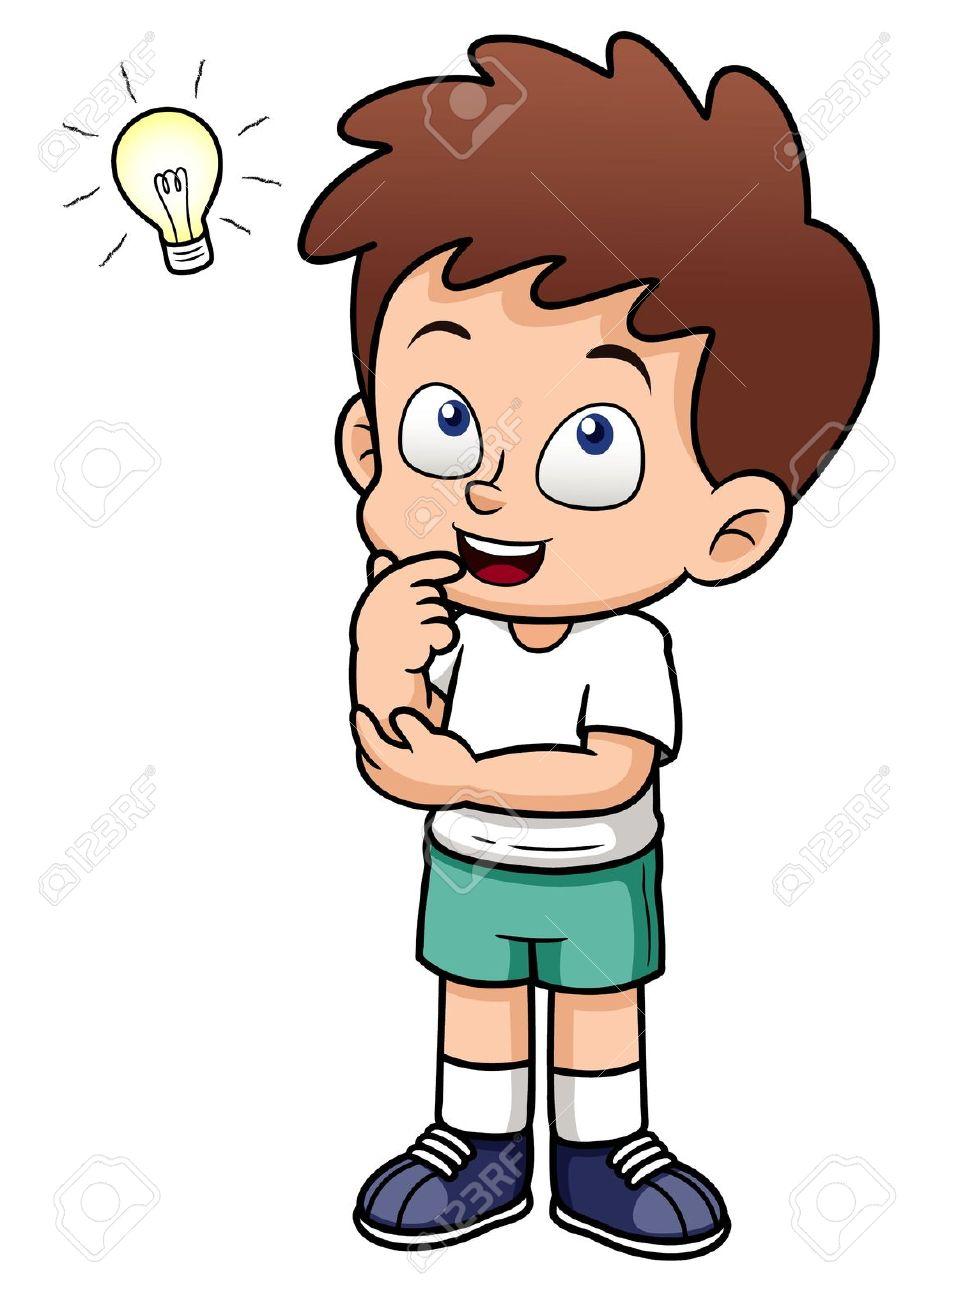 Winning clipart intelligent boy Com Thinking #14285 Clipartion Best